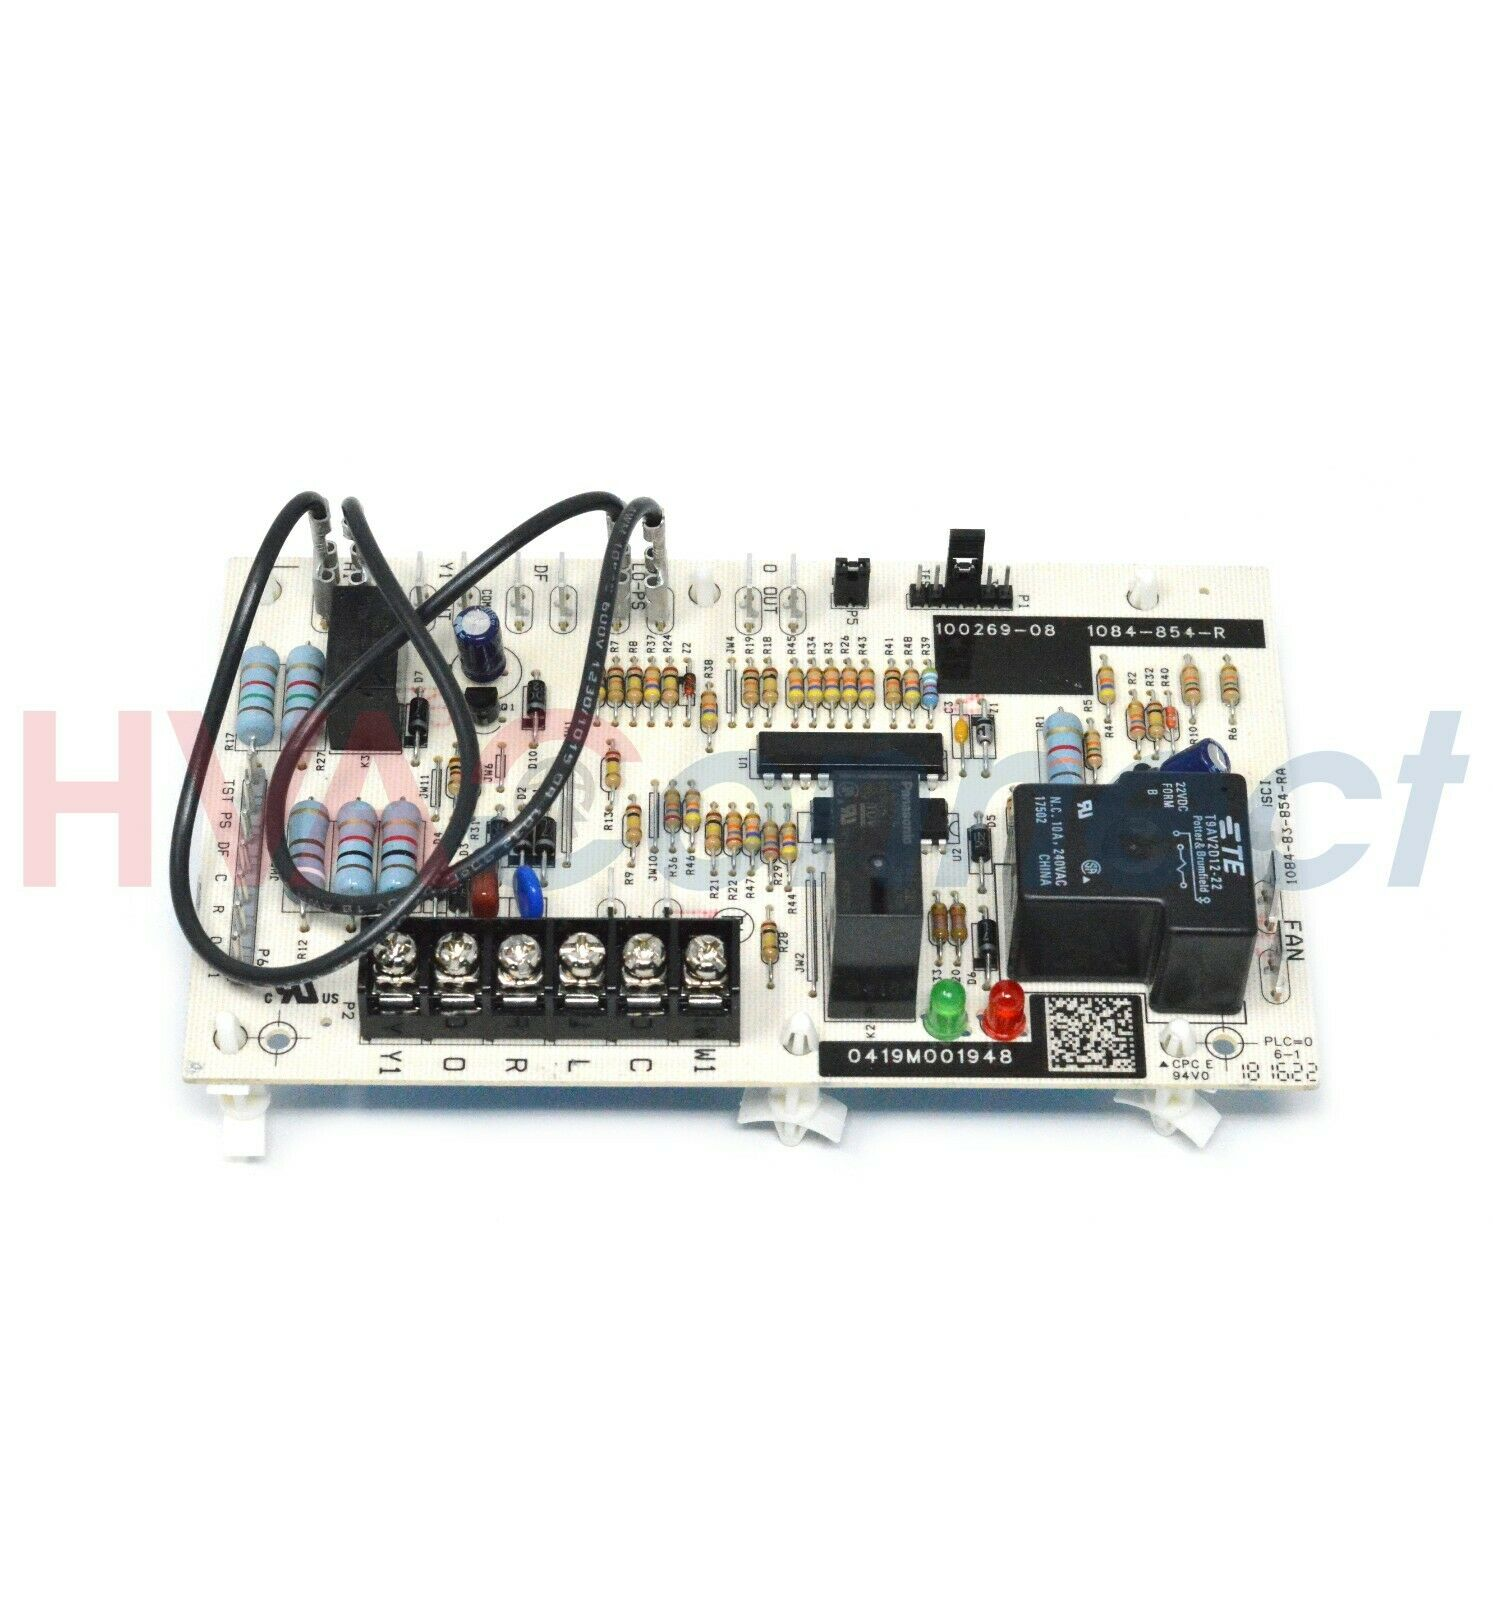 OEM Lennox Armstrong Ducane Defrost Control Board 34M63 34M6301 29M01 29M0101